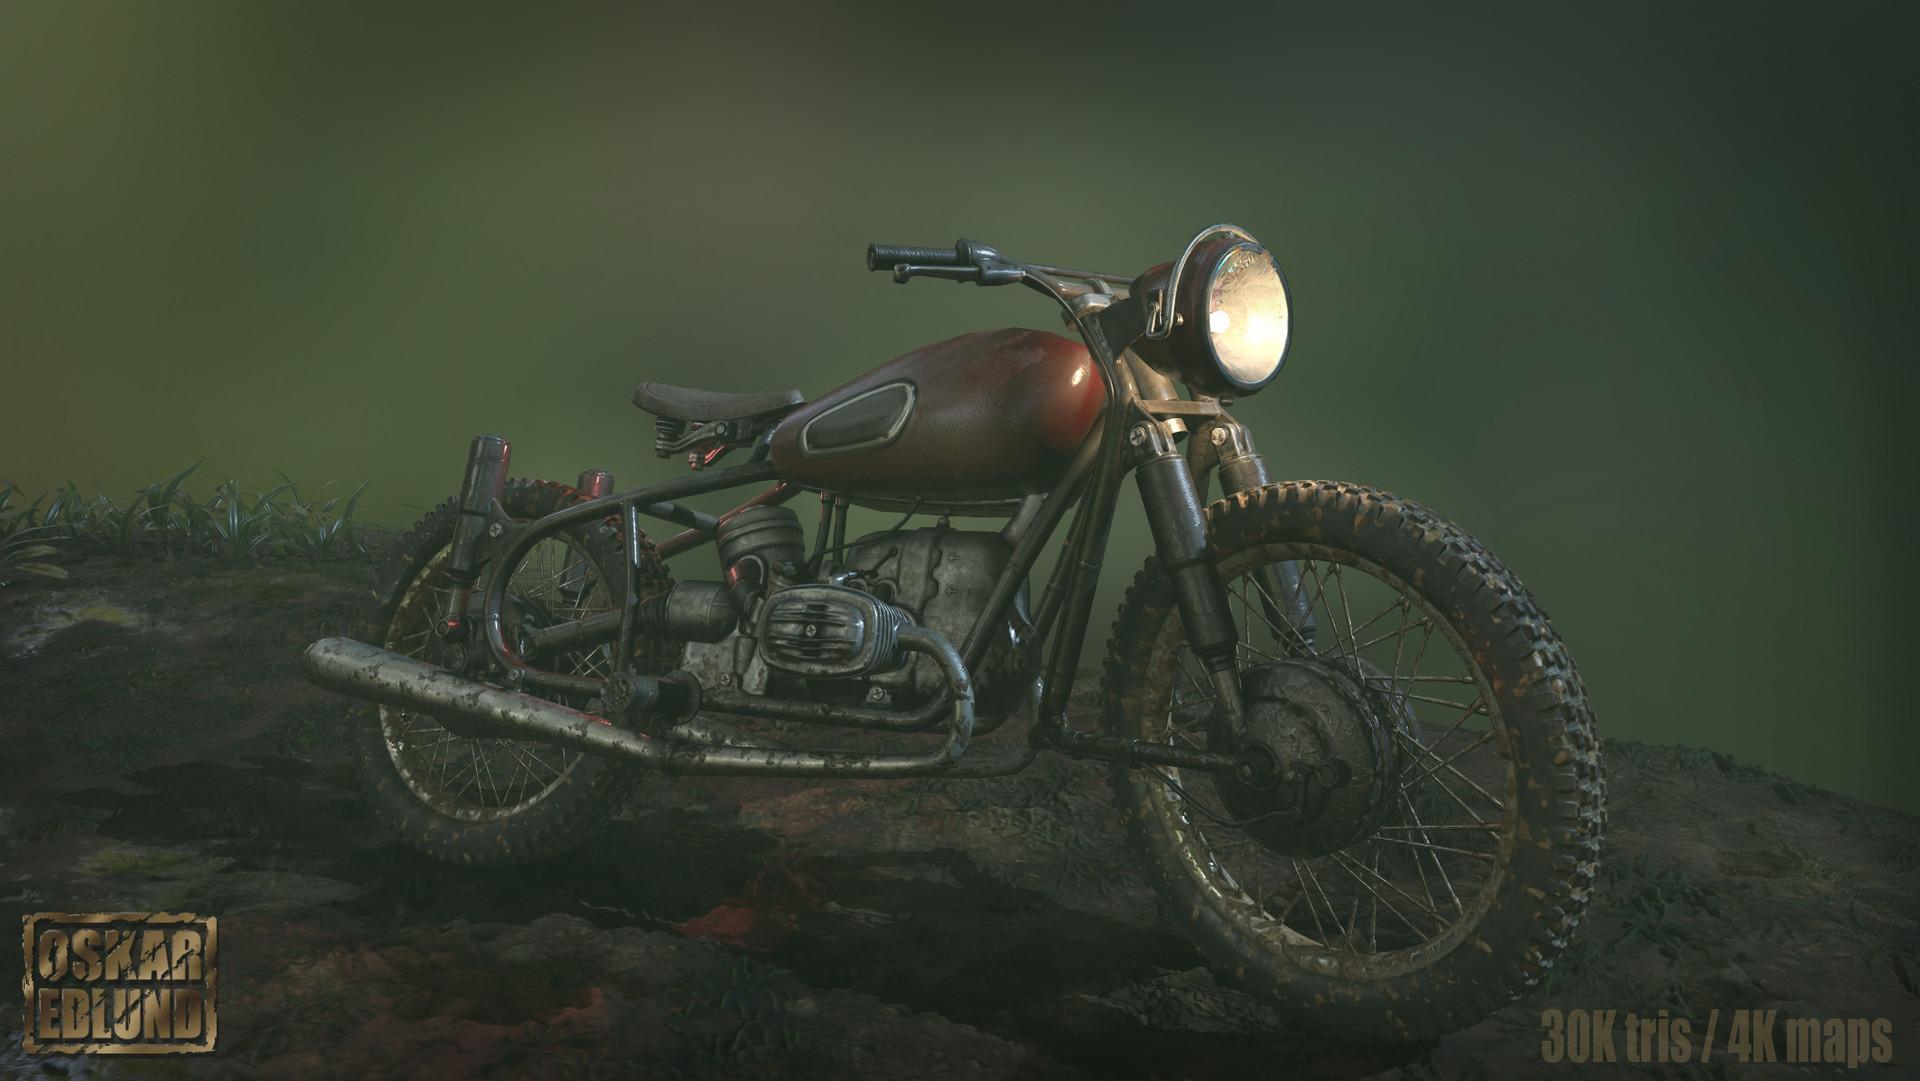 Oskar edlund bike 01